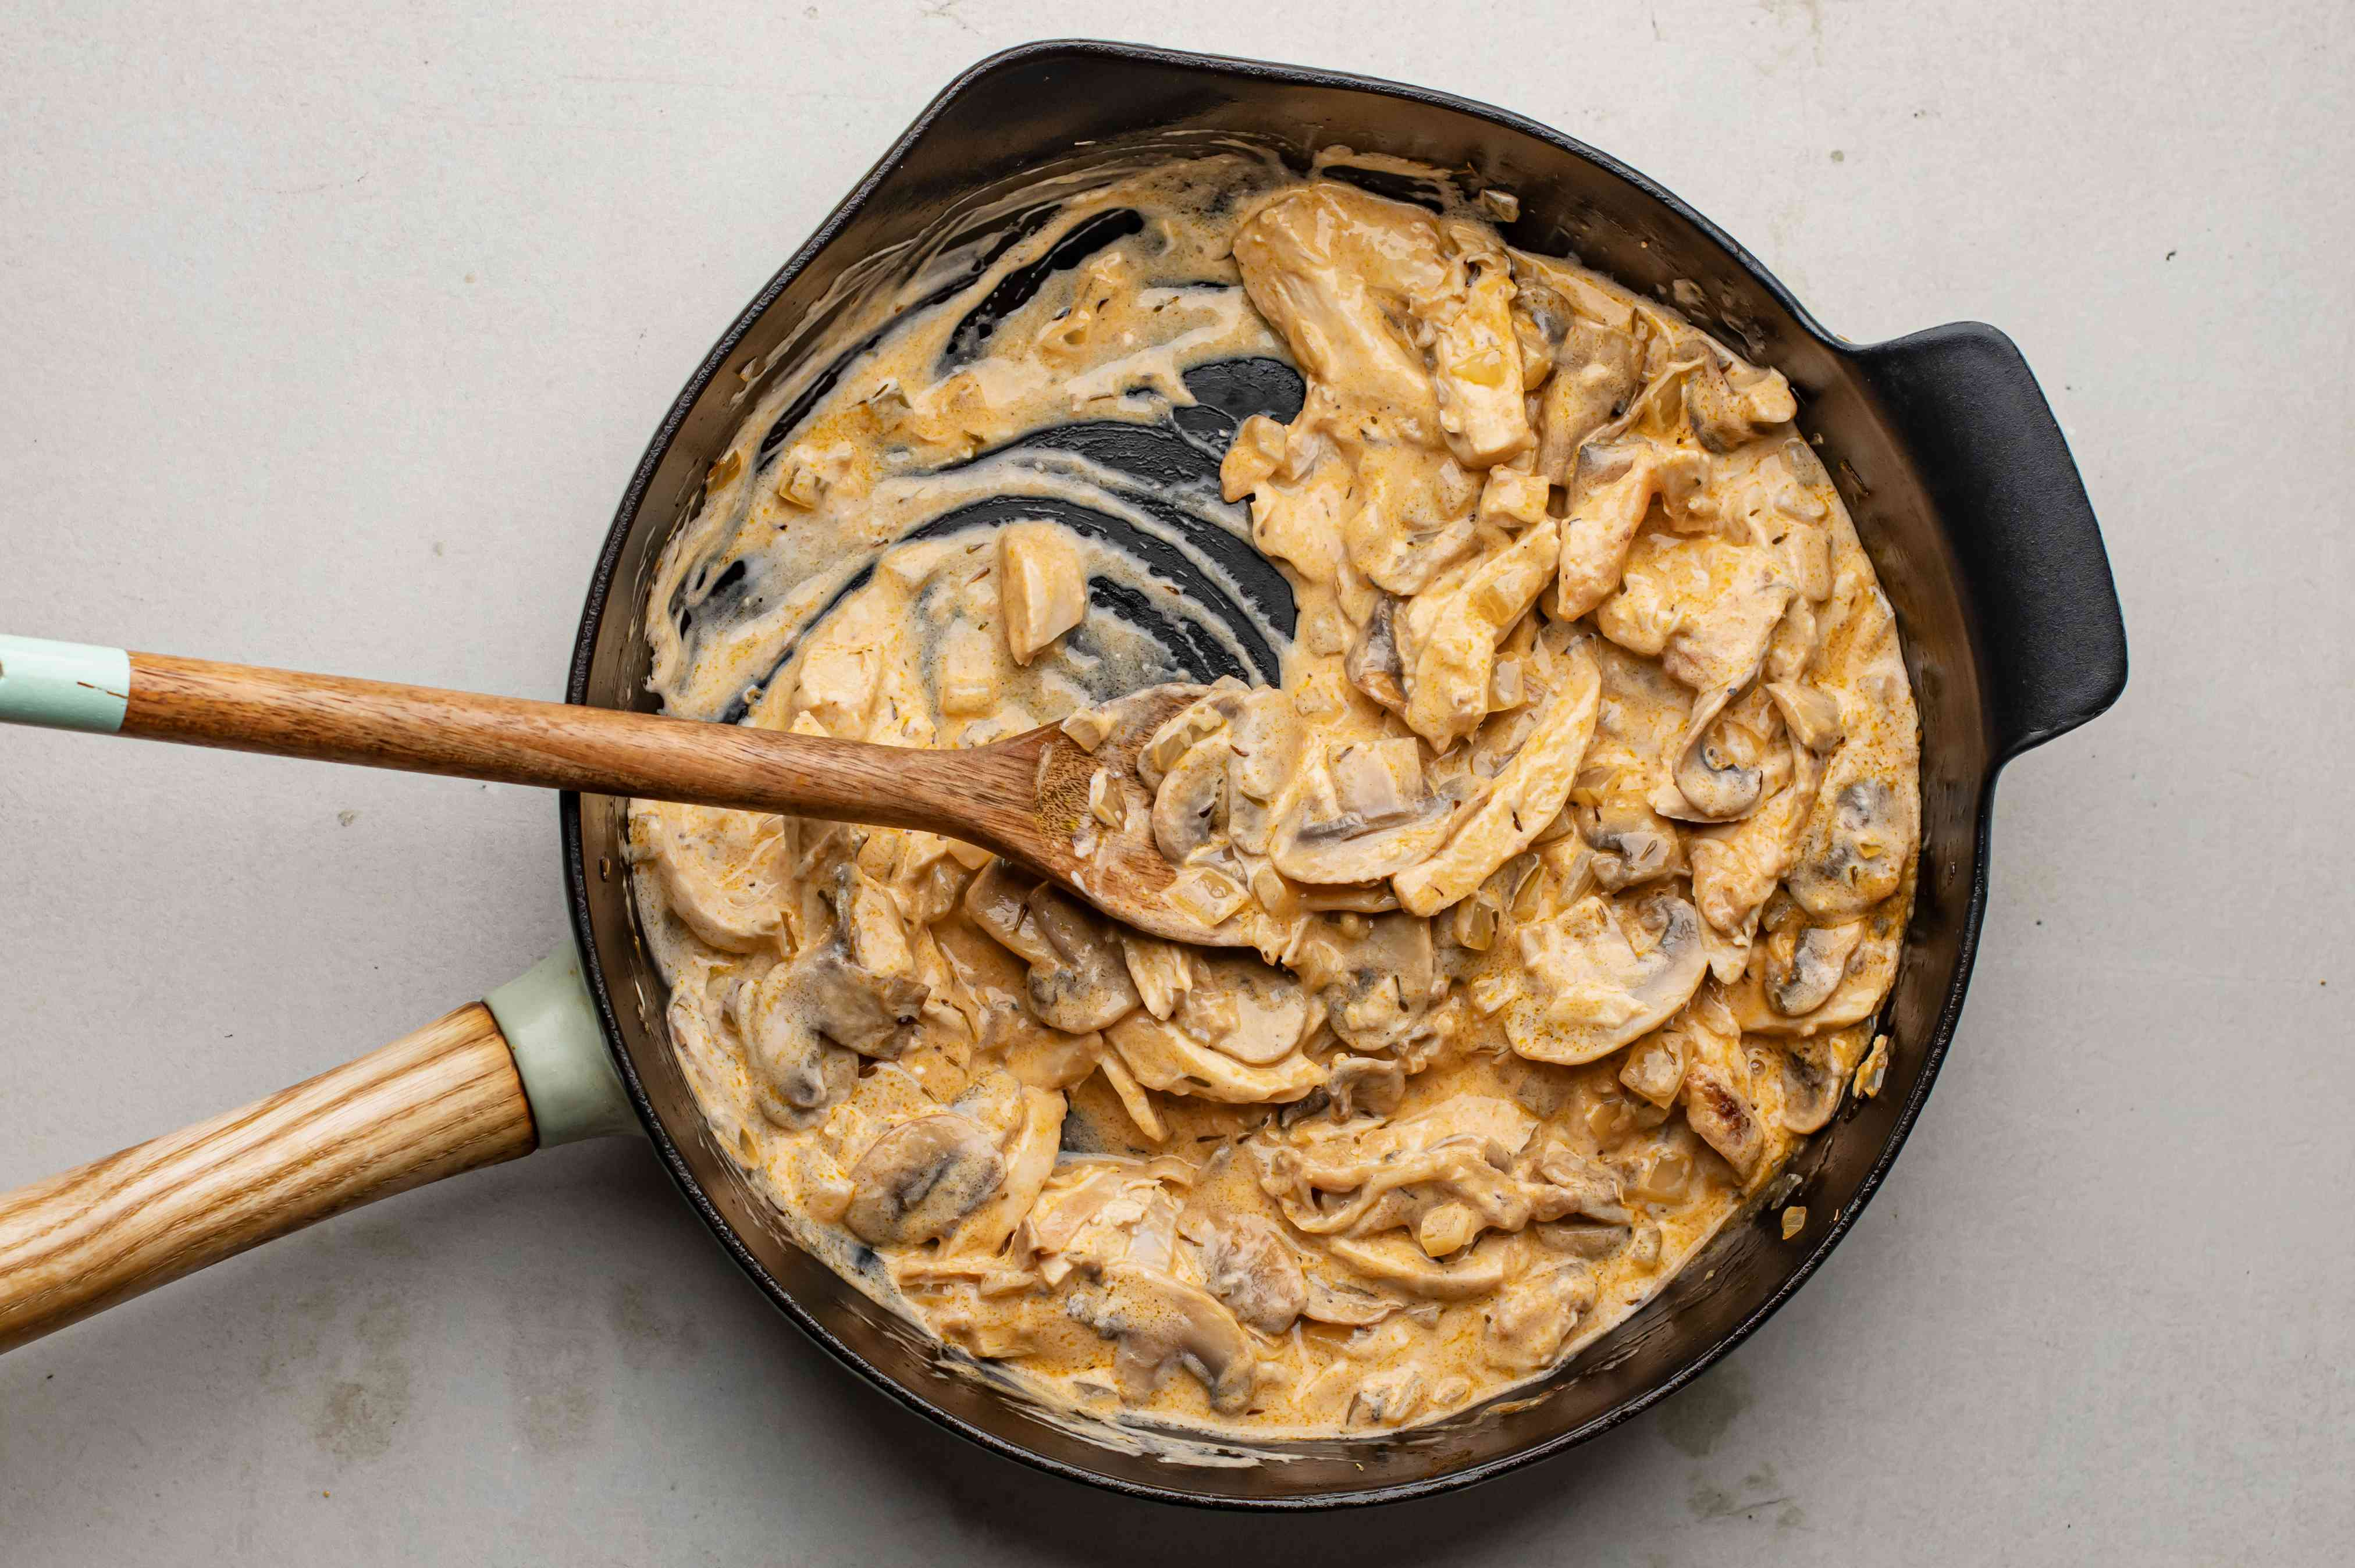 Stirring sour cream into beef stroganoff